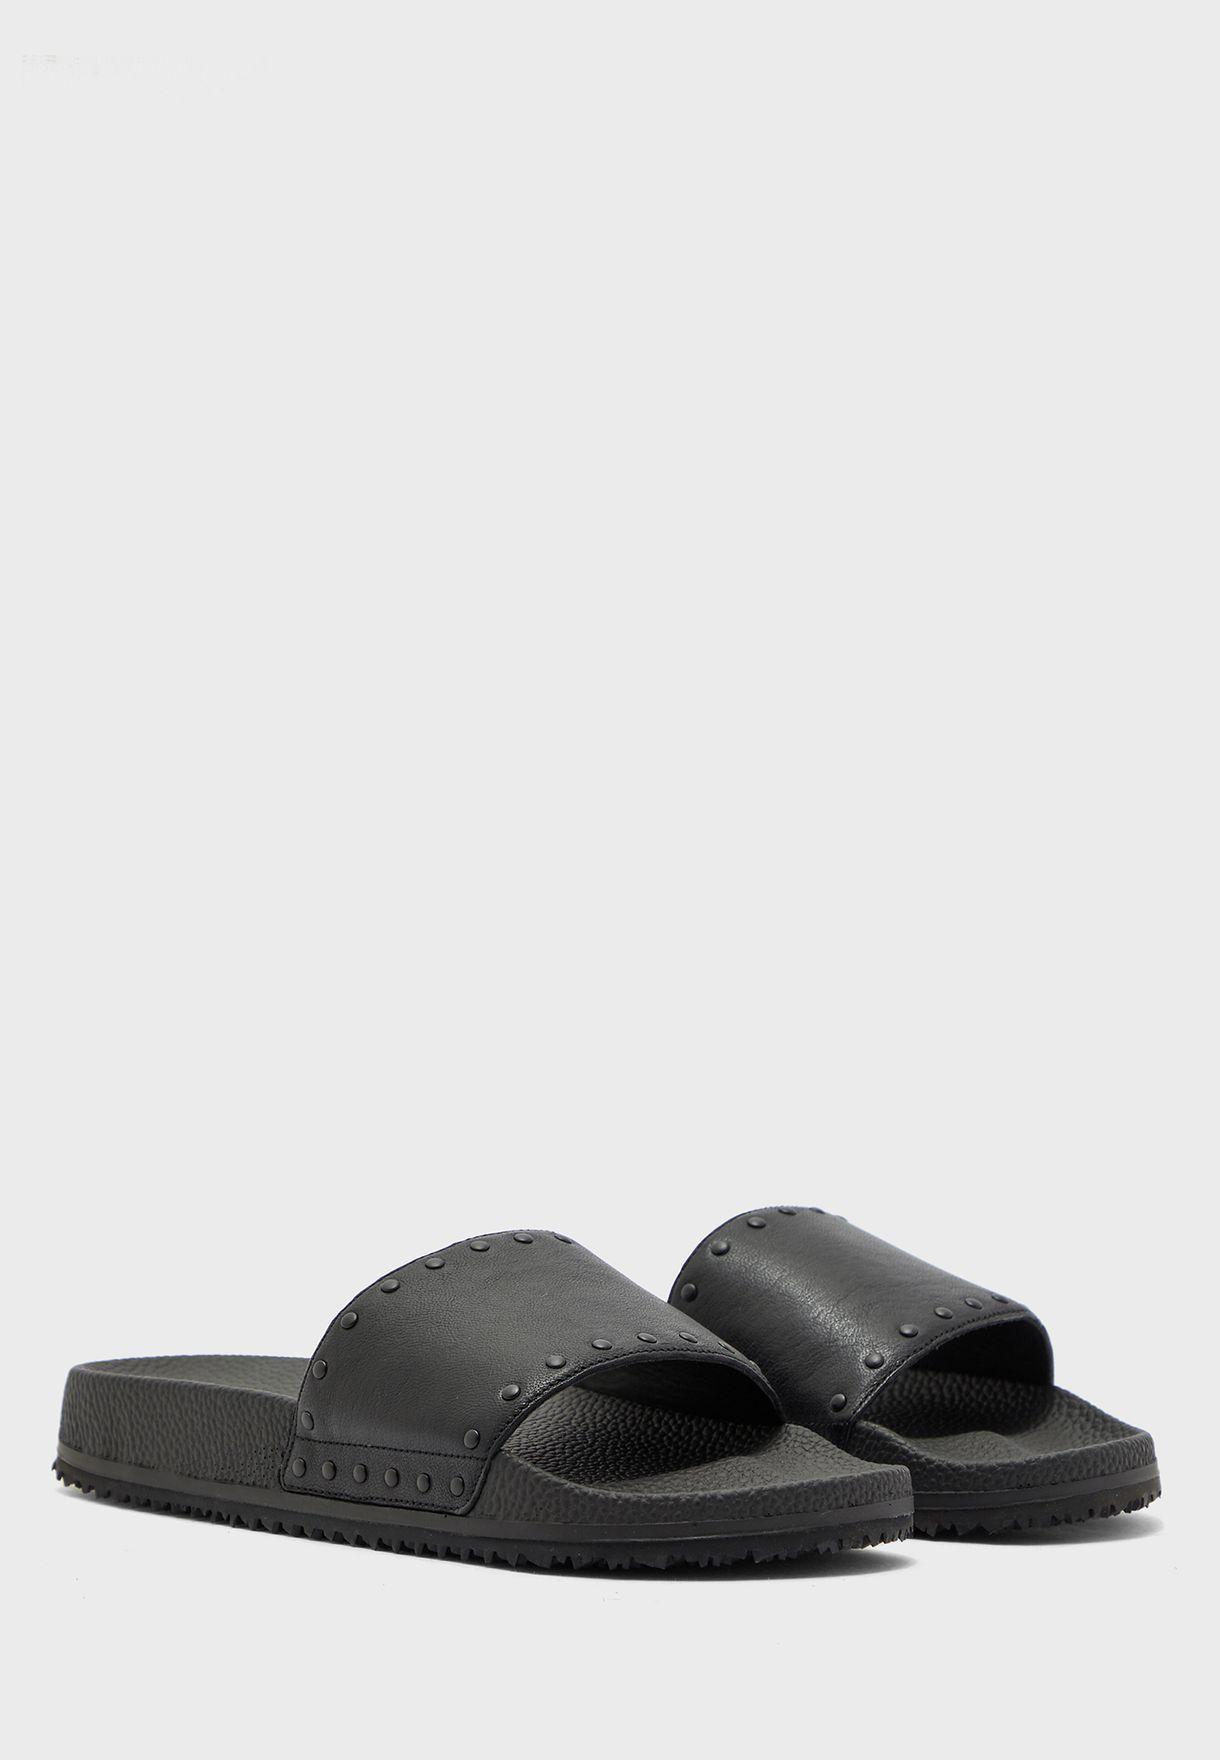 Studded Pool Sandals